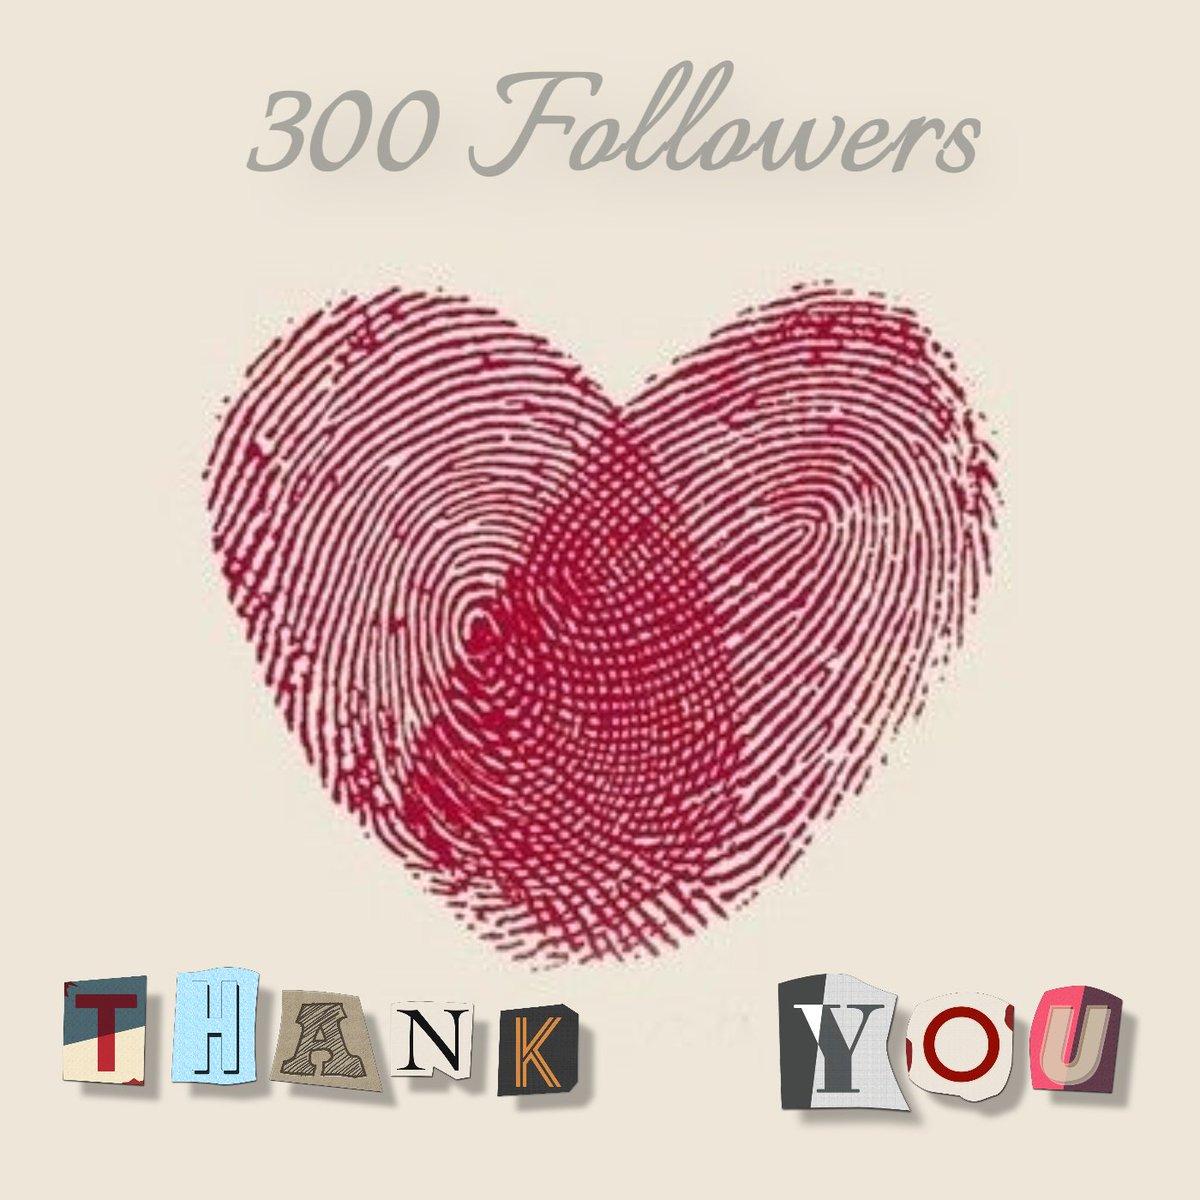 Seule on va plus vite, Ensemble on va plus loin  MERCI MY FOLLOWERS big kiss #followers  #LIKEs #ThankYou #merci #partage #love #kiss <br>http://pic.twitter.com/A6hzRyfxkd